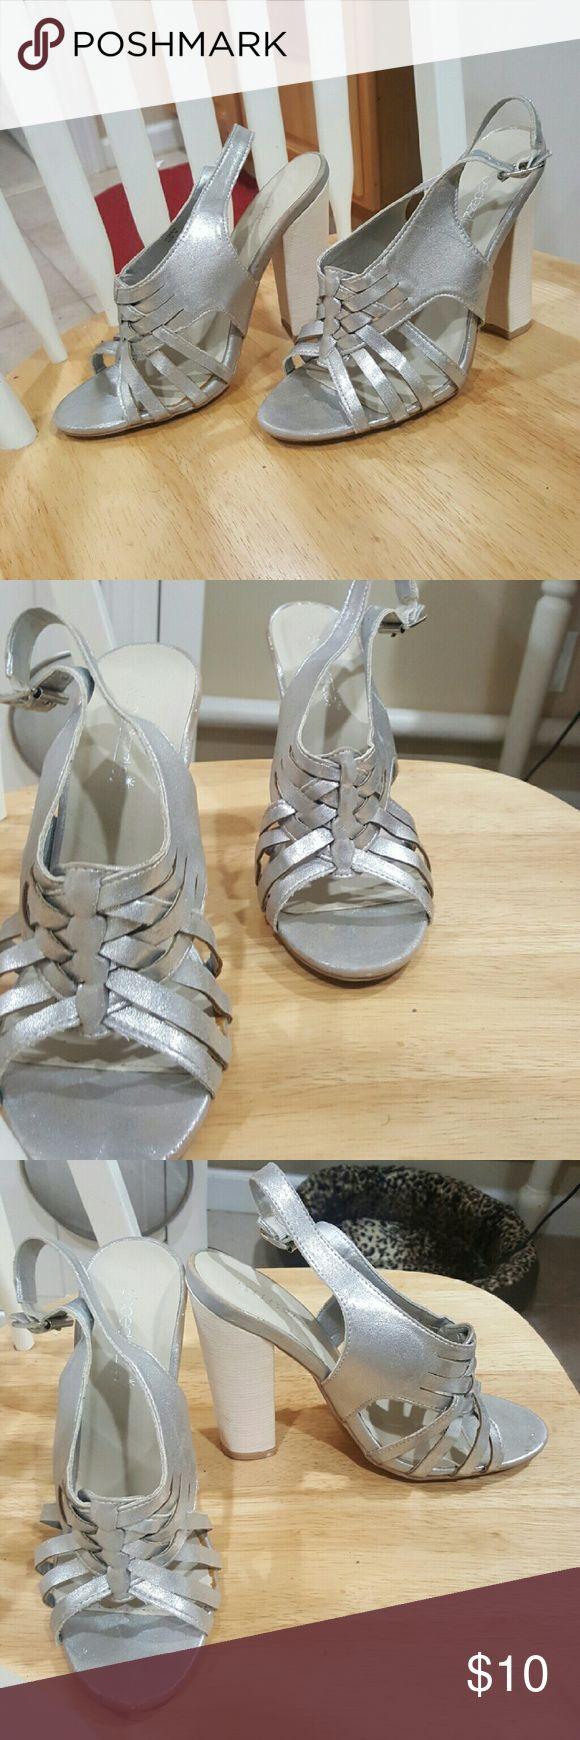 Shoedazzle silver chunky heels Item: silver chunky heels  Brand: shoedazzle  Size: 8 Condition: very good Shoe Dazzle Shoes Heels